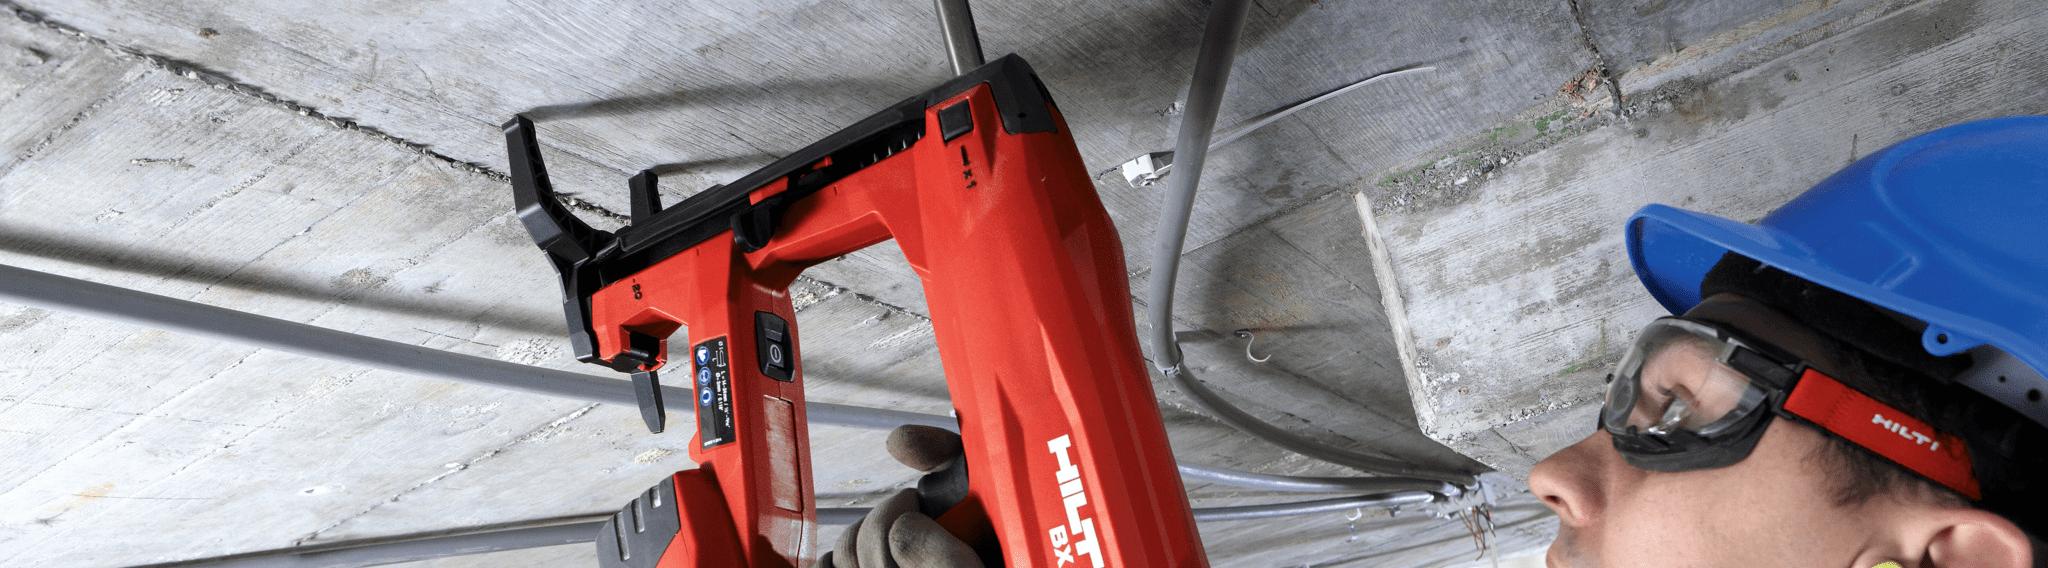 Referenzen HILTI AG Bauarbeiter